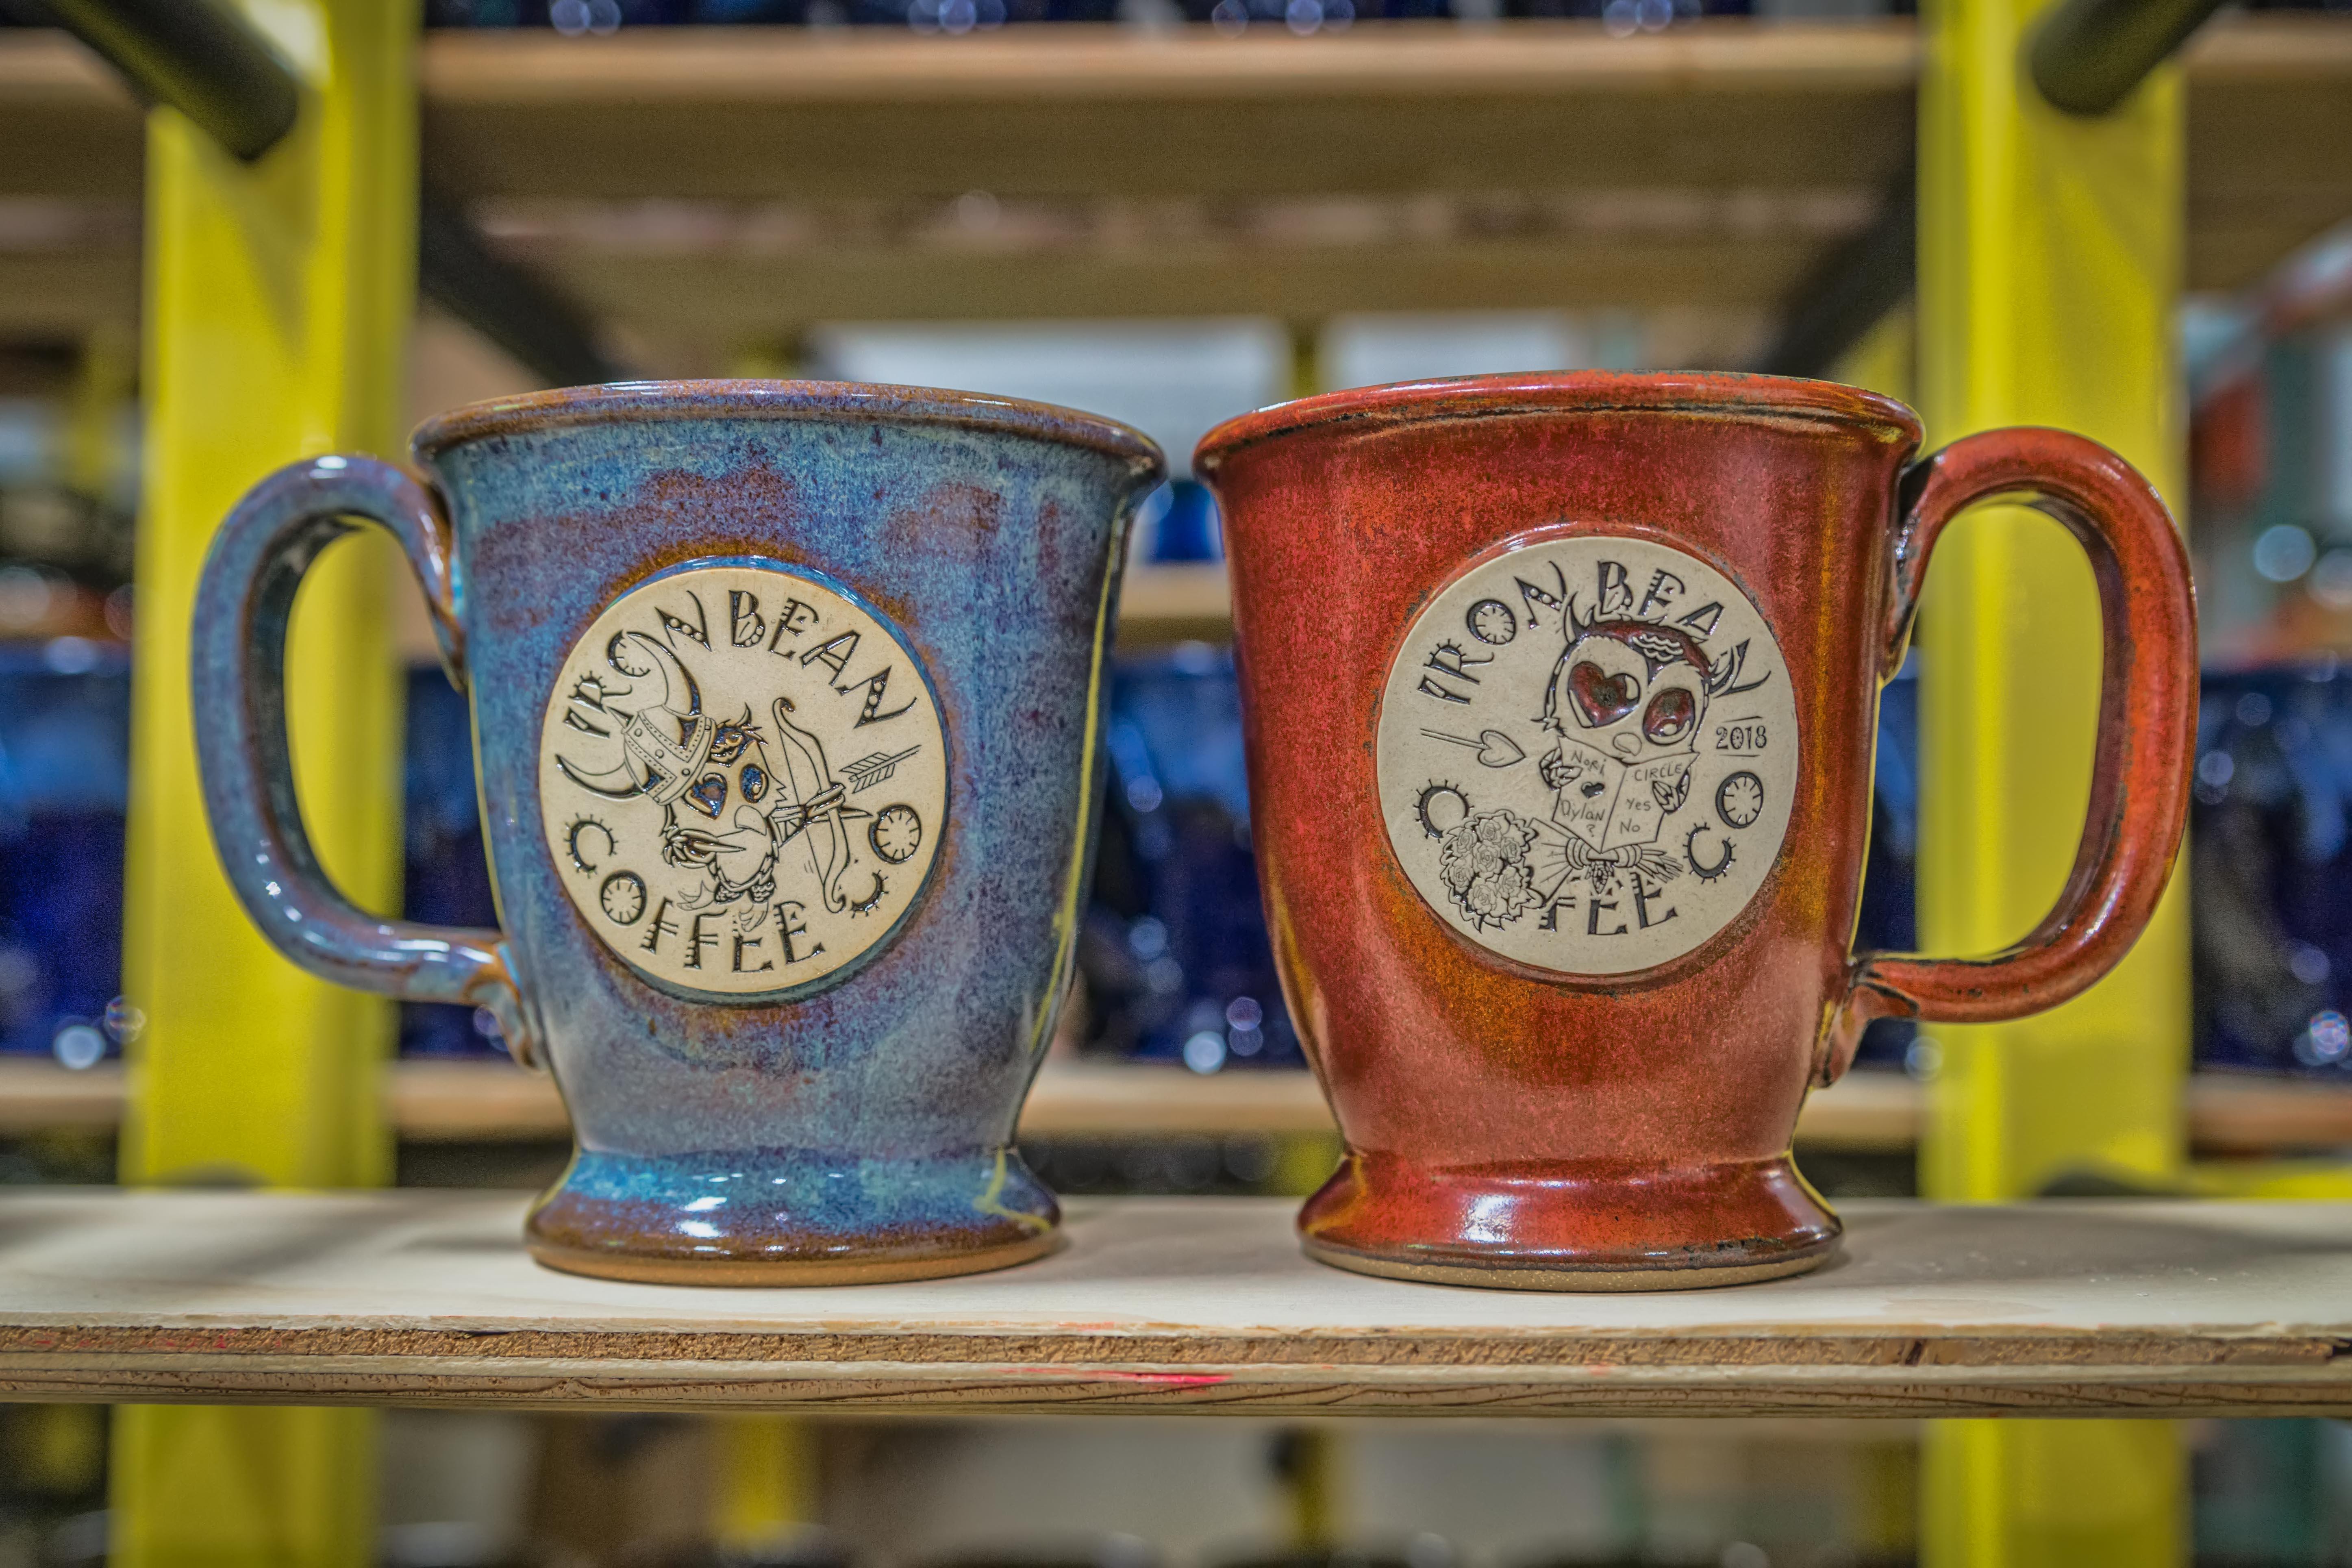 Iron Bean Valentine's Day mug set